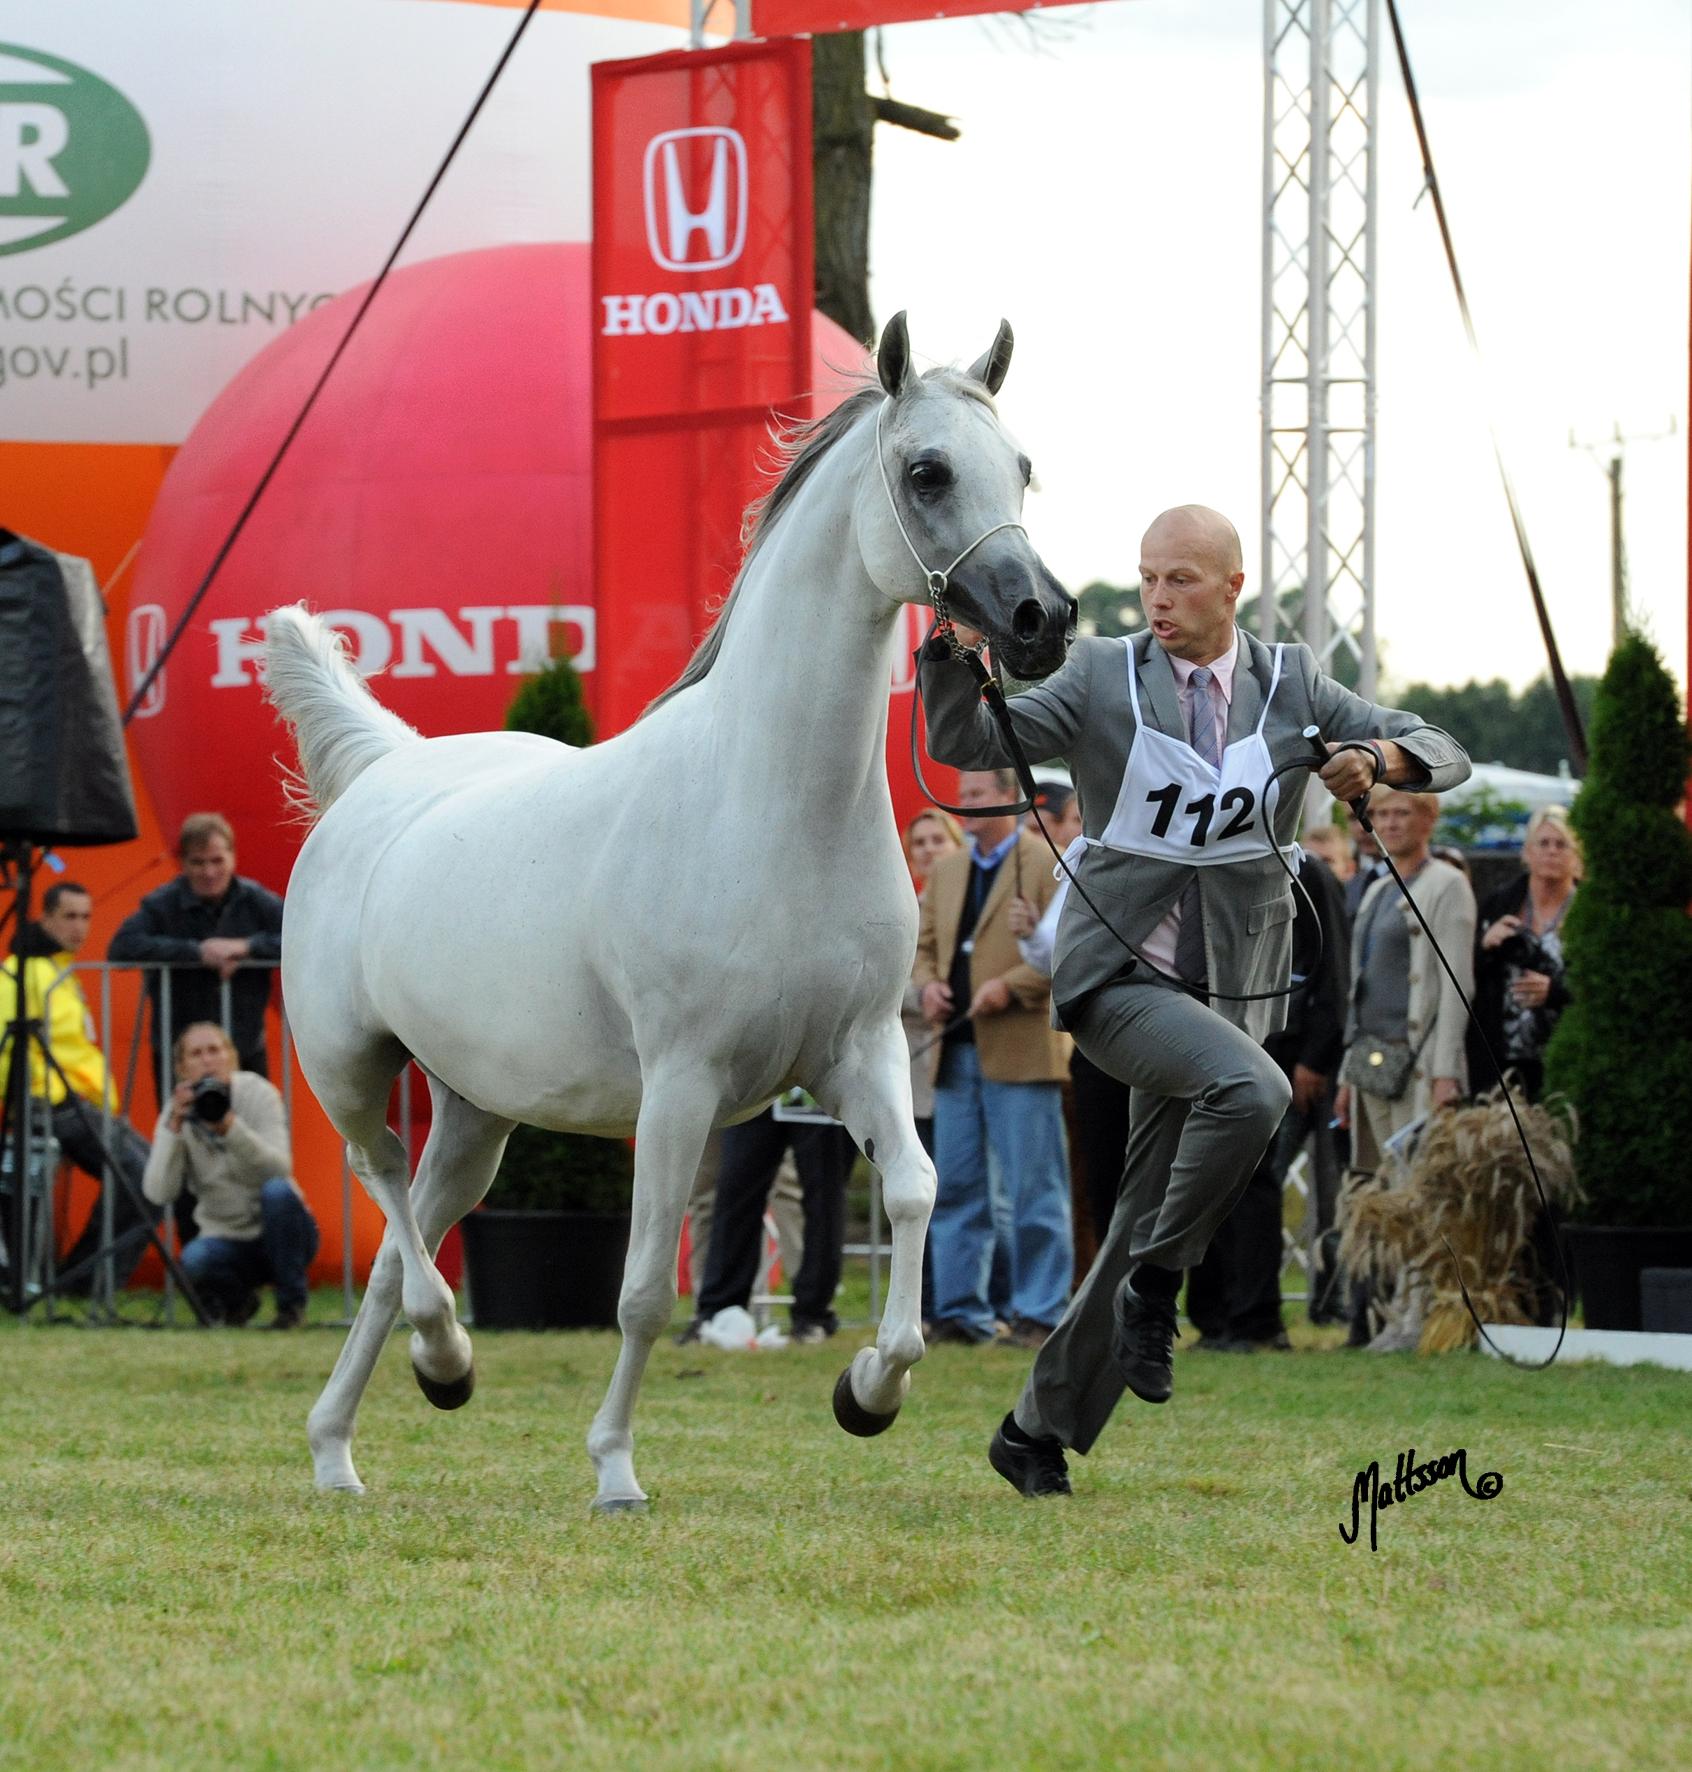 Palmeta at the 2012 Polish National Show